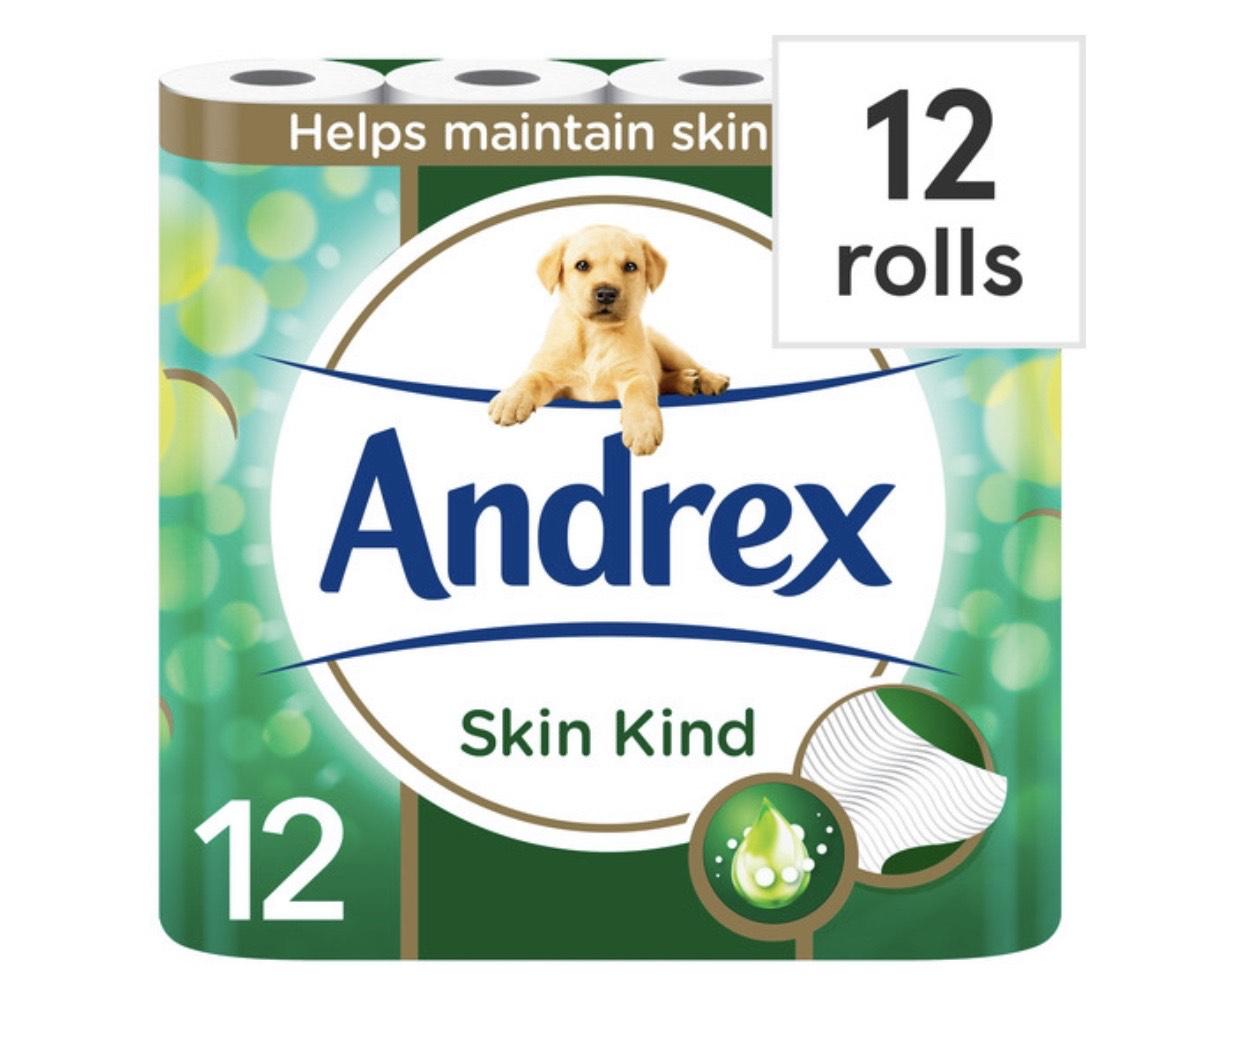 Andrex skin kind 12 pack of toilet rolls £2.75 instore Tesco Hanley